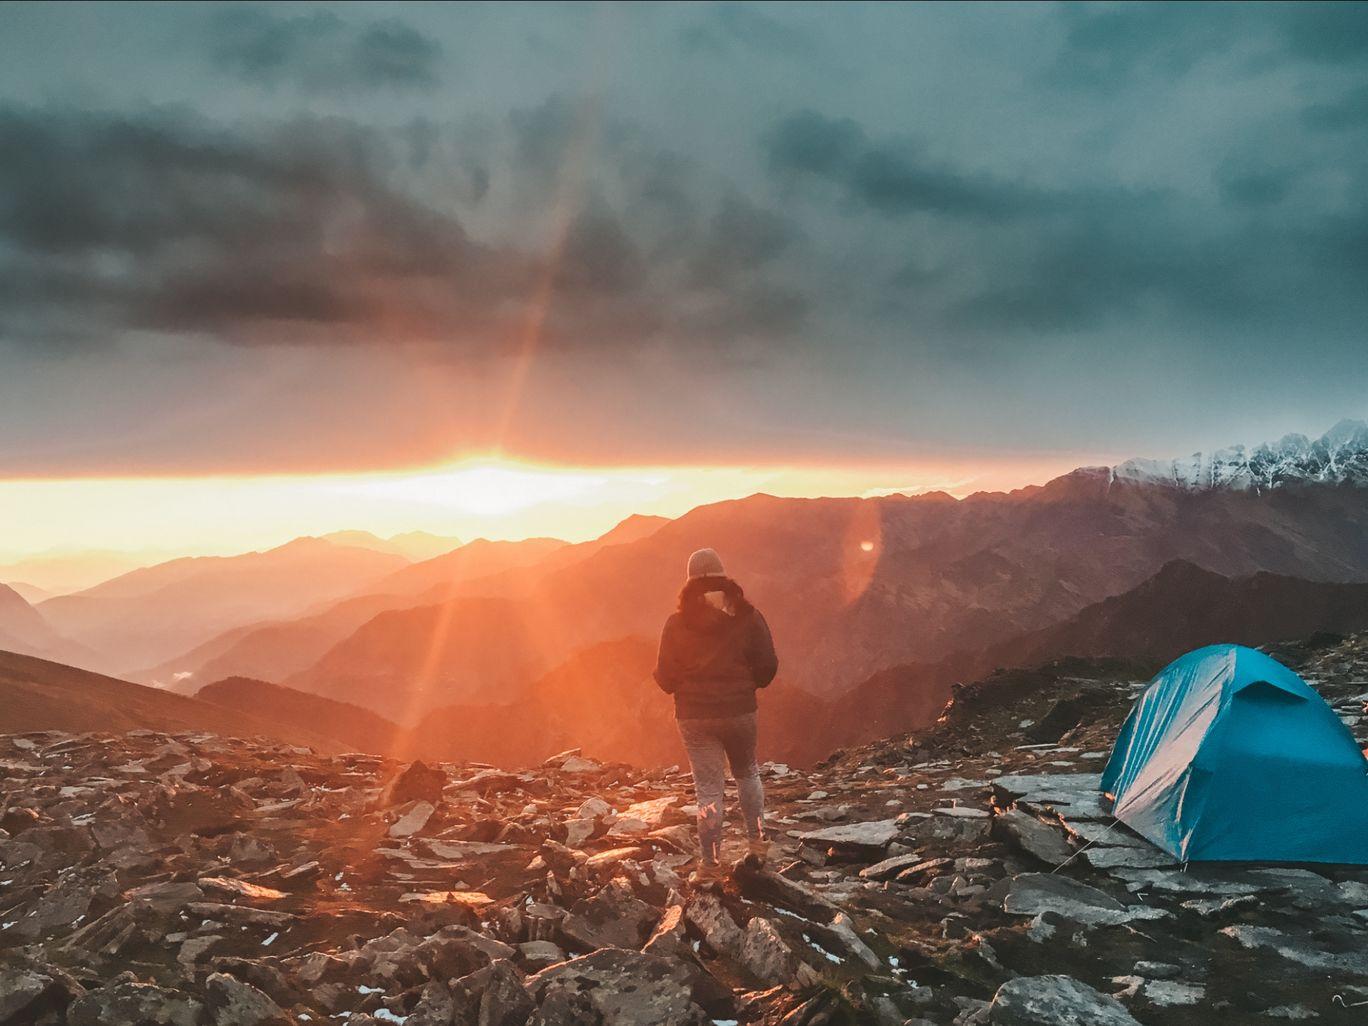 Photo of Himalayas By Prashanti Ramesh